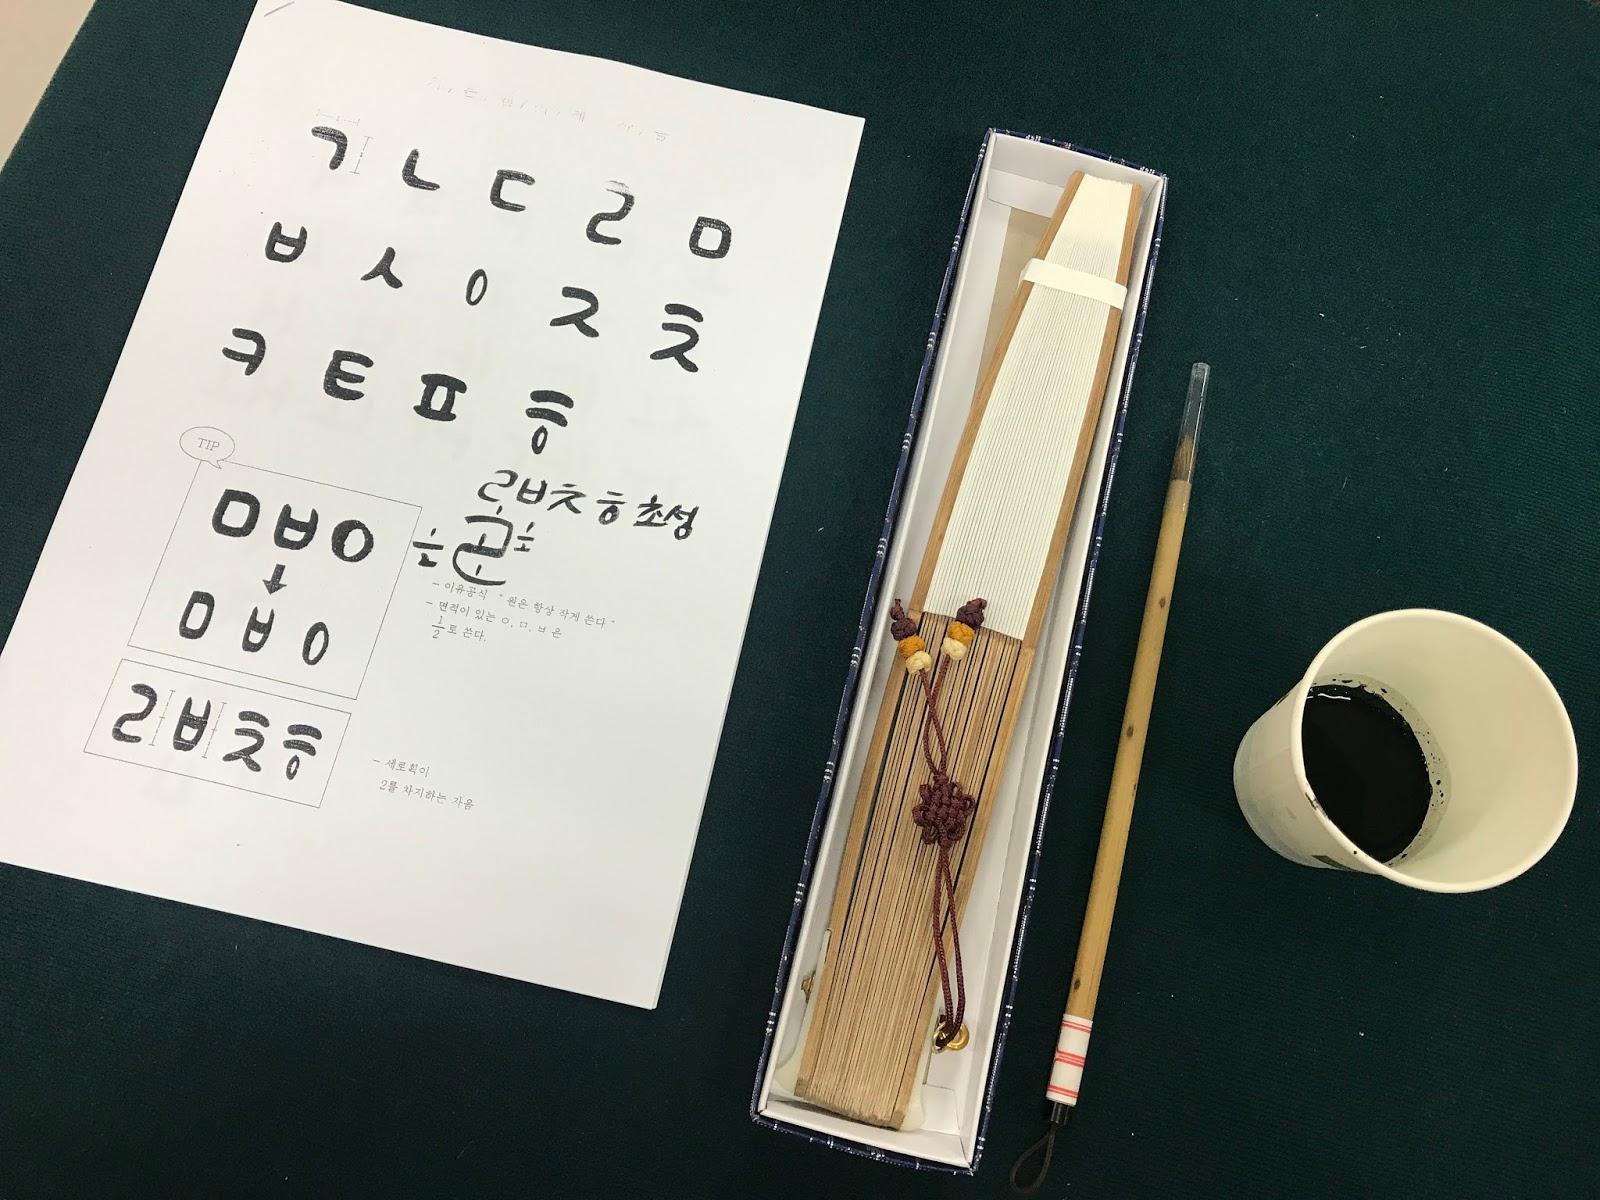 Drawing Straight Lines With Brush In Photo : London nuna: inje university report week 1: korean calligraphy class